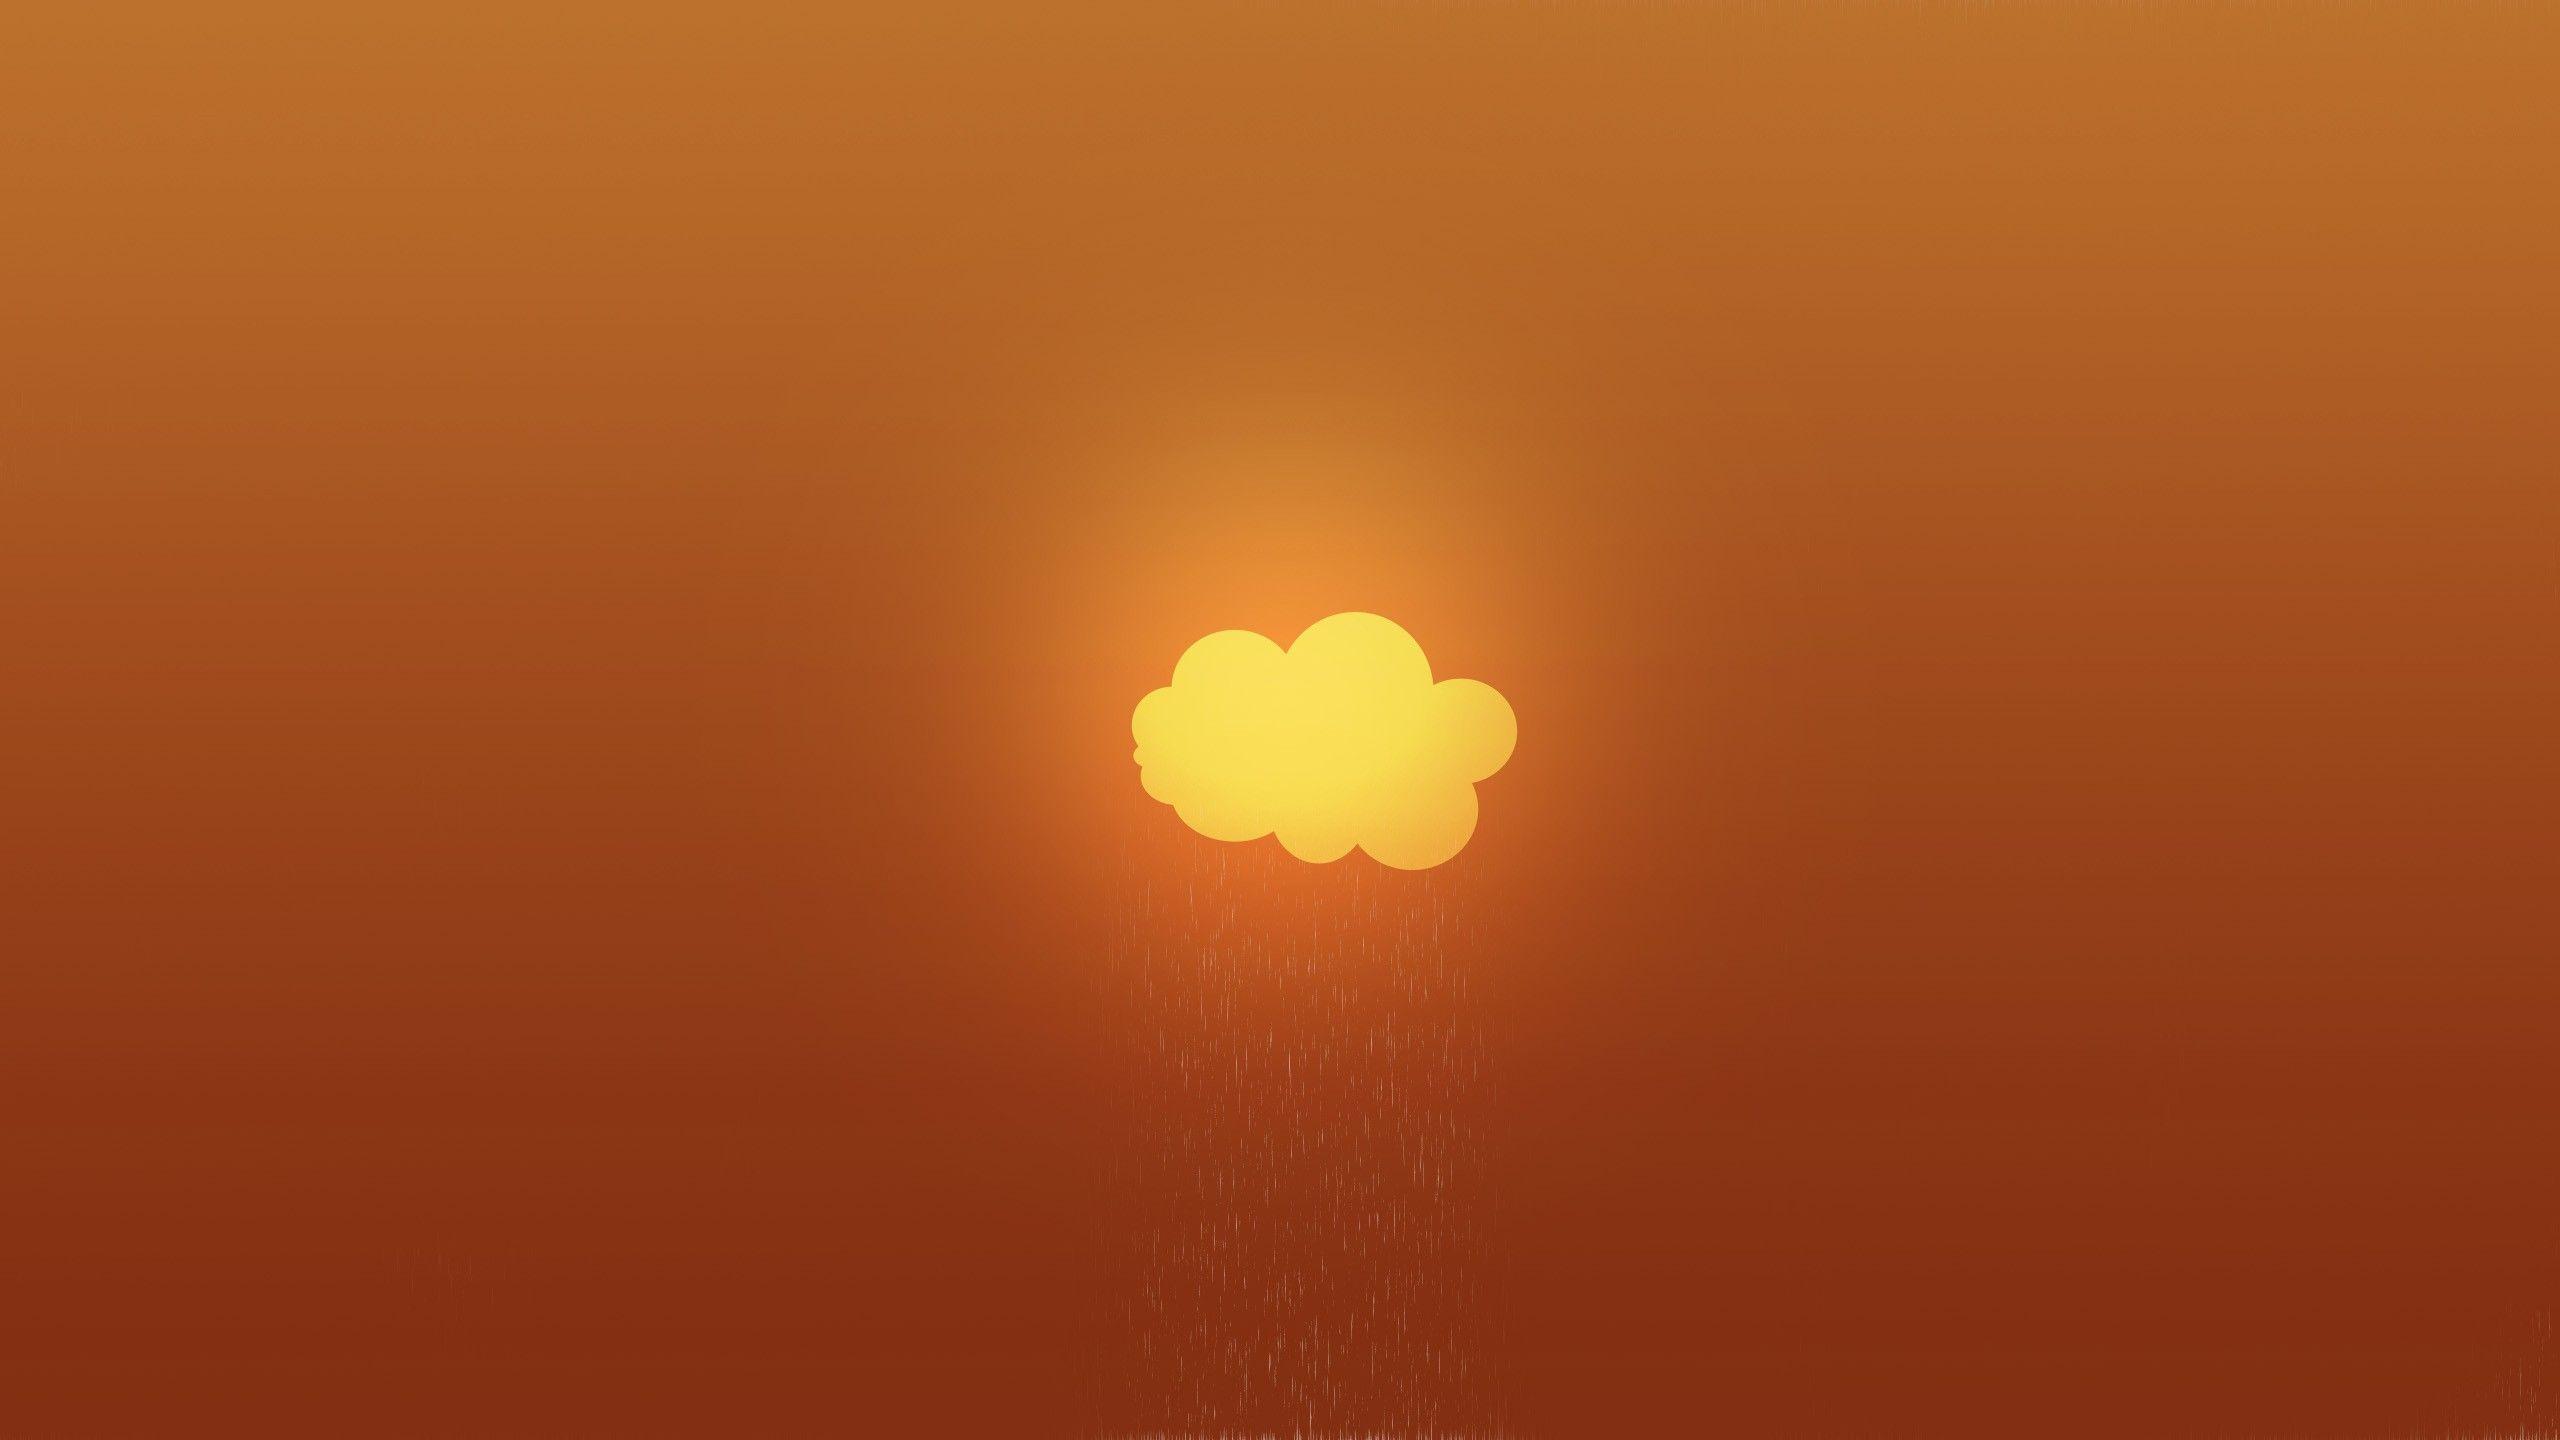 Clouds Minimalistic Orange Gradient 2560x1440 Wallpaper Wallpaper Art Memes Photo Art